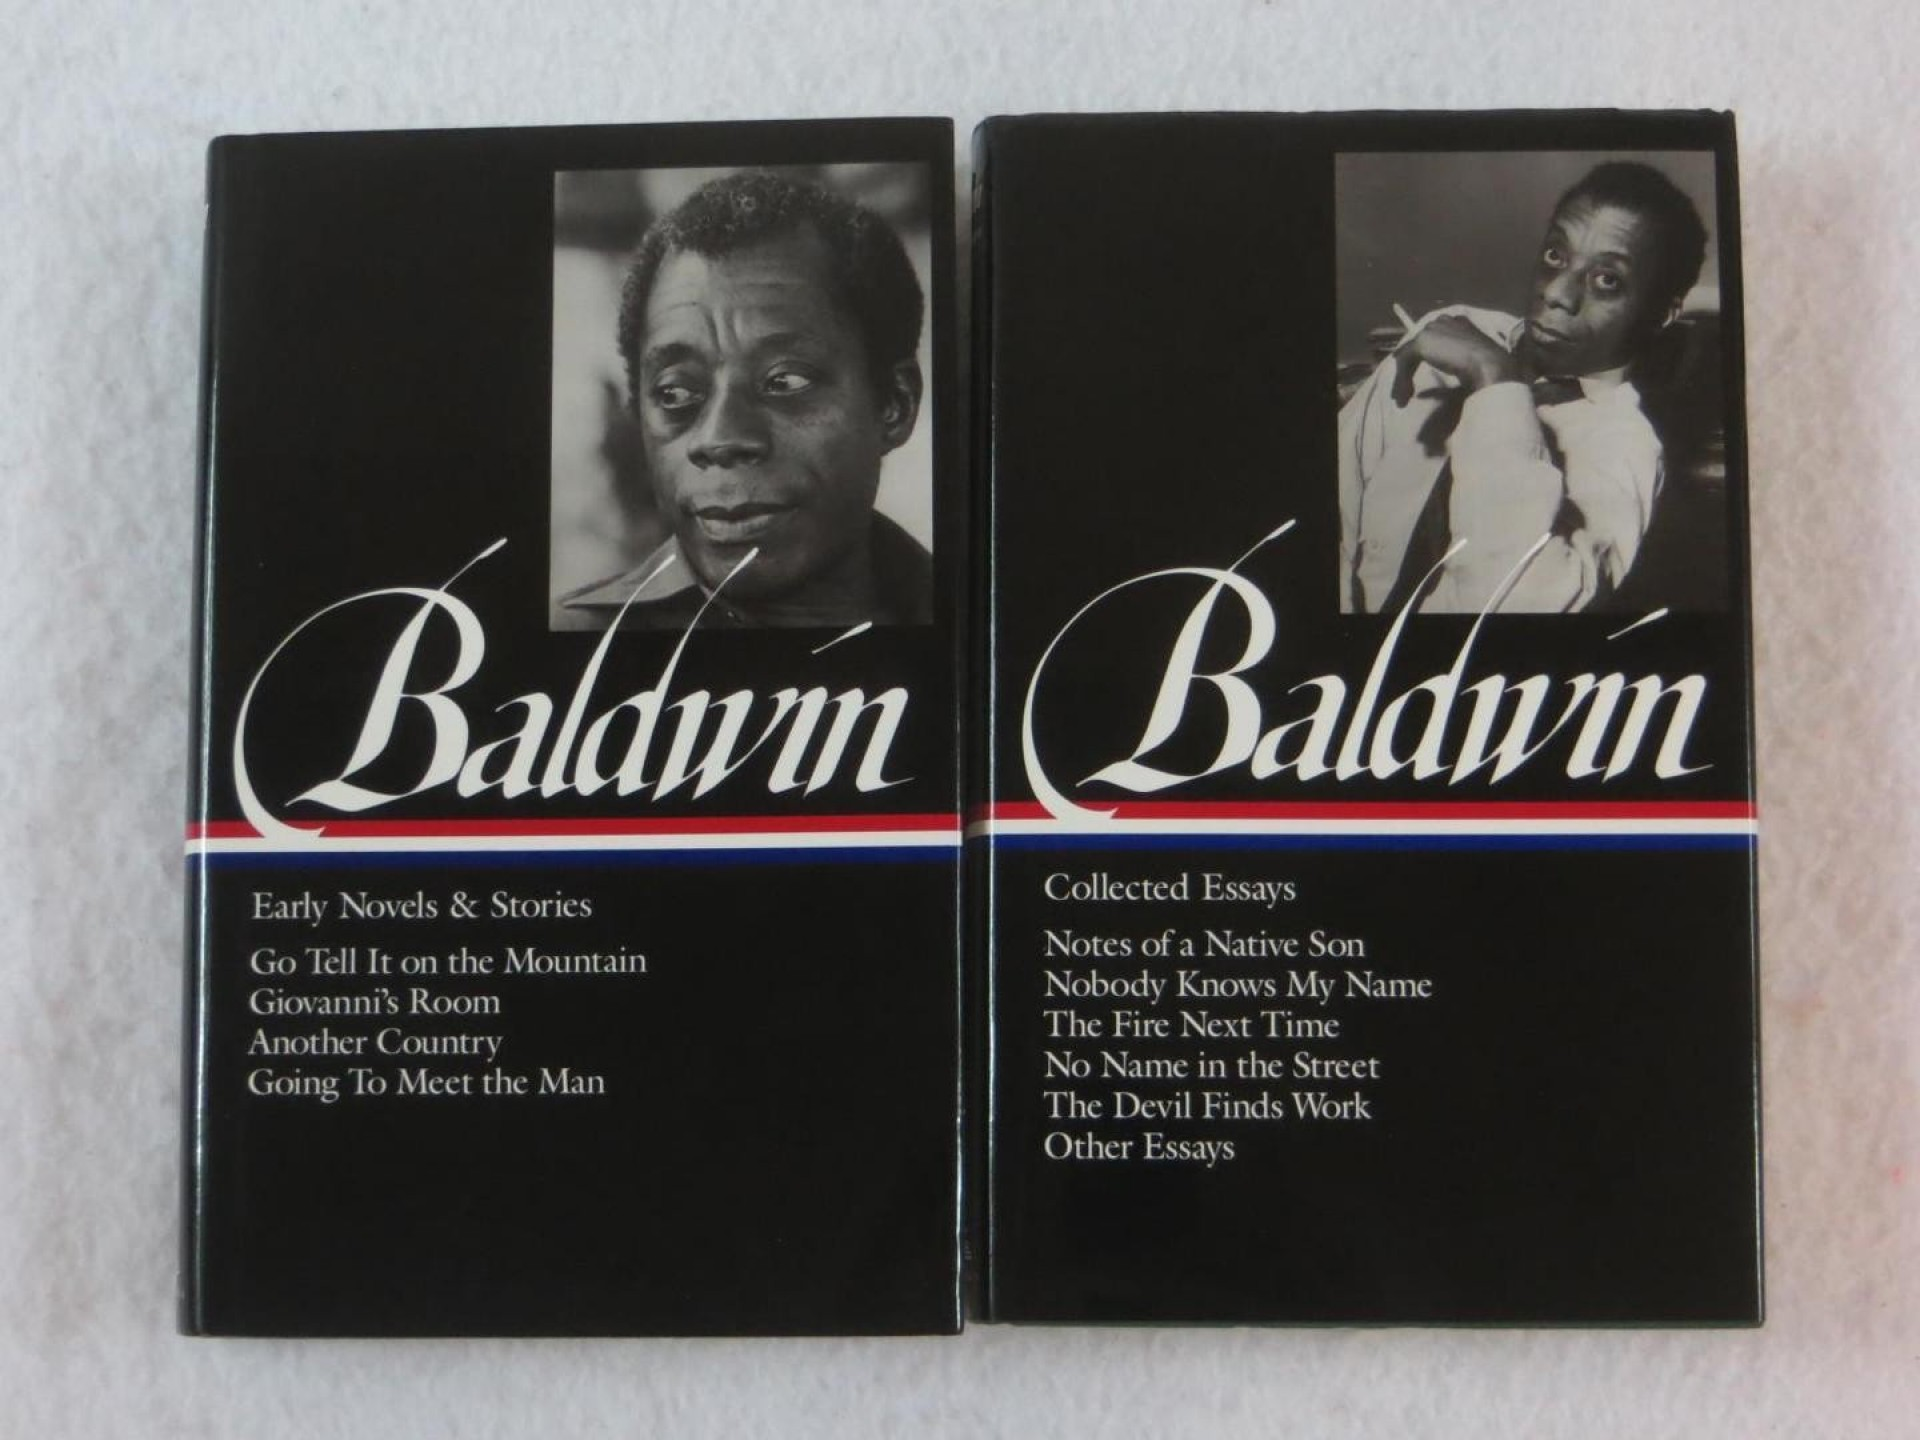 011 1 928ee5893cf657b9cc053e80e6d2614e Essay Example James Baldwin Collected Wondrous Essays Table Of Contents Ebook Google Books 1920